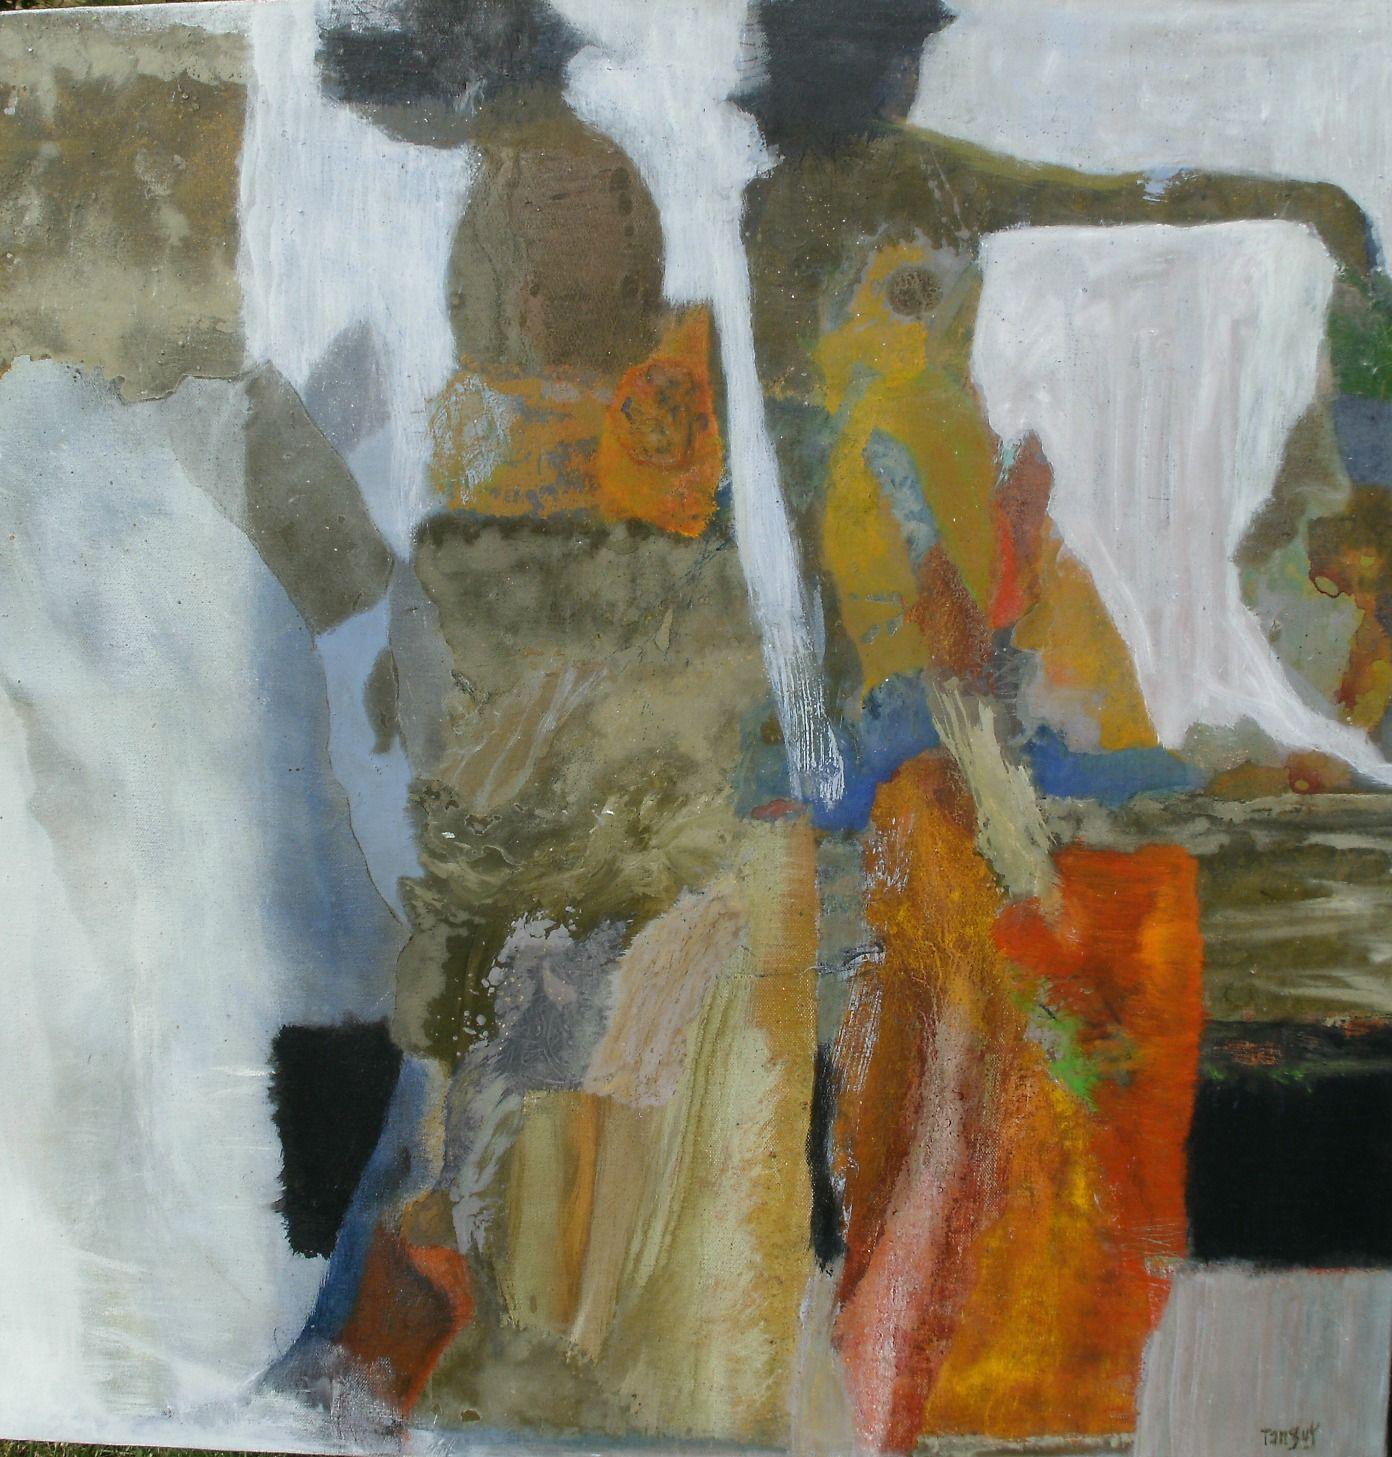 Tanguy Kan · Artiste Peintre Artiste peintre, Peintre